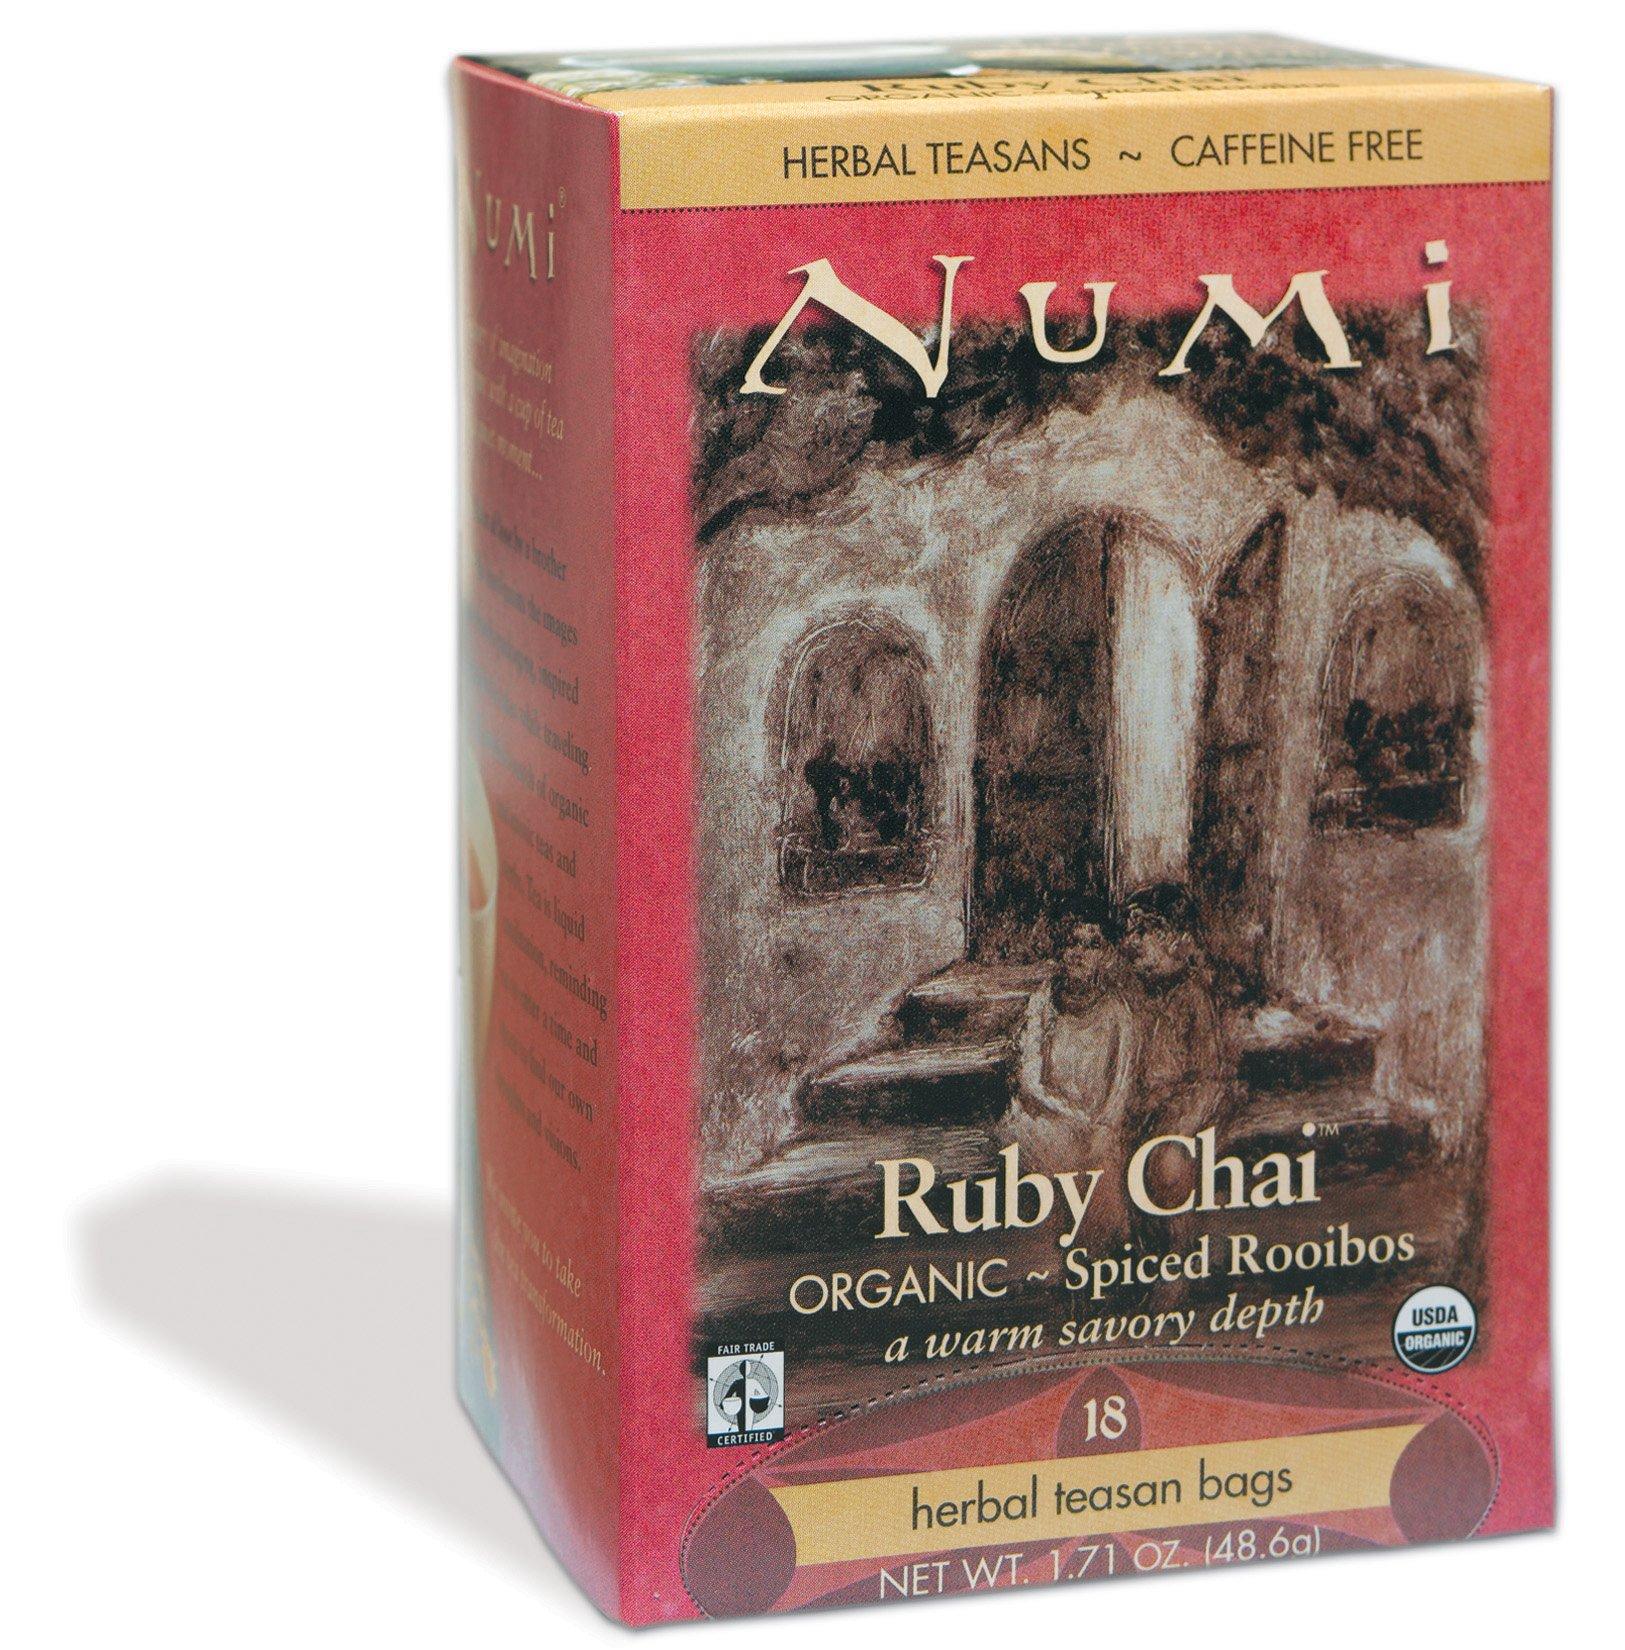 Numi Organic Tea Ruby Chai - Spiced Rooibos, Herbal Teasan in Teabags, 18-Count Box (Pack of 6) by Numi Organic Tea